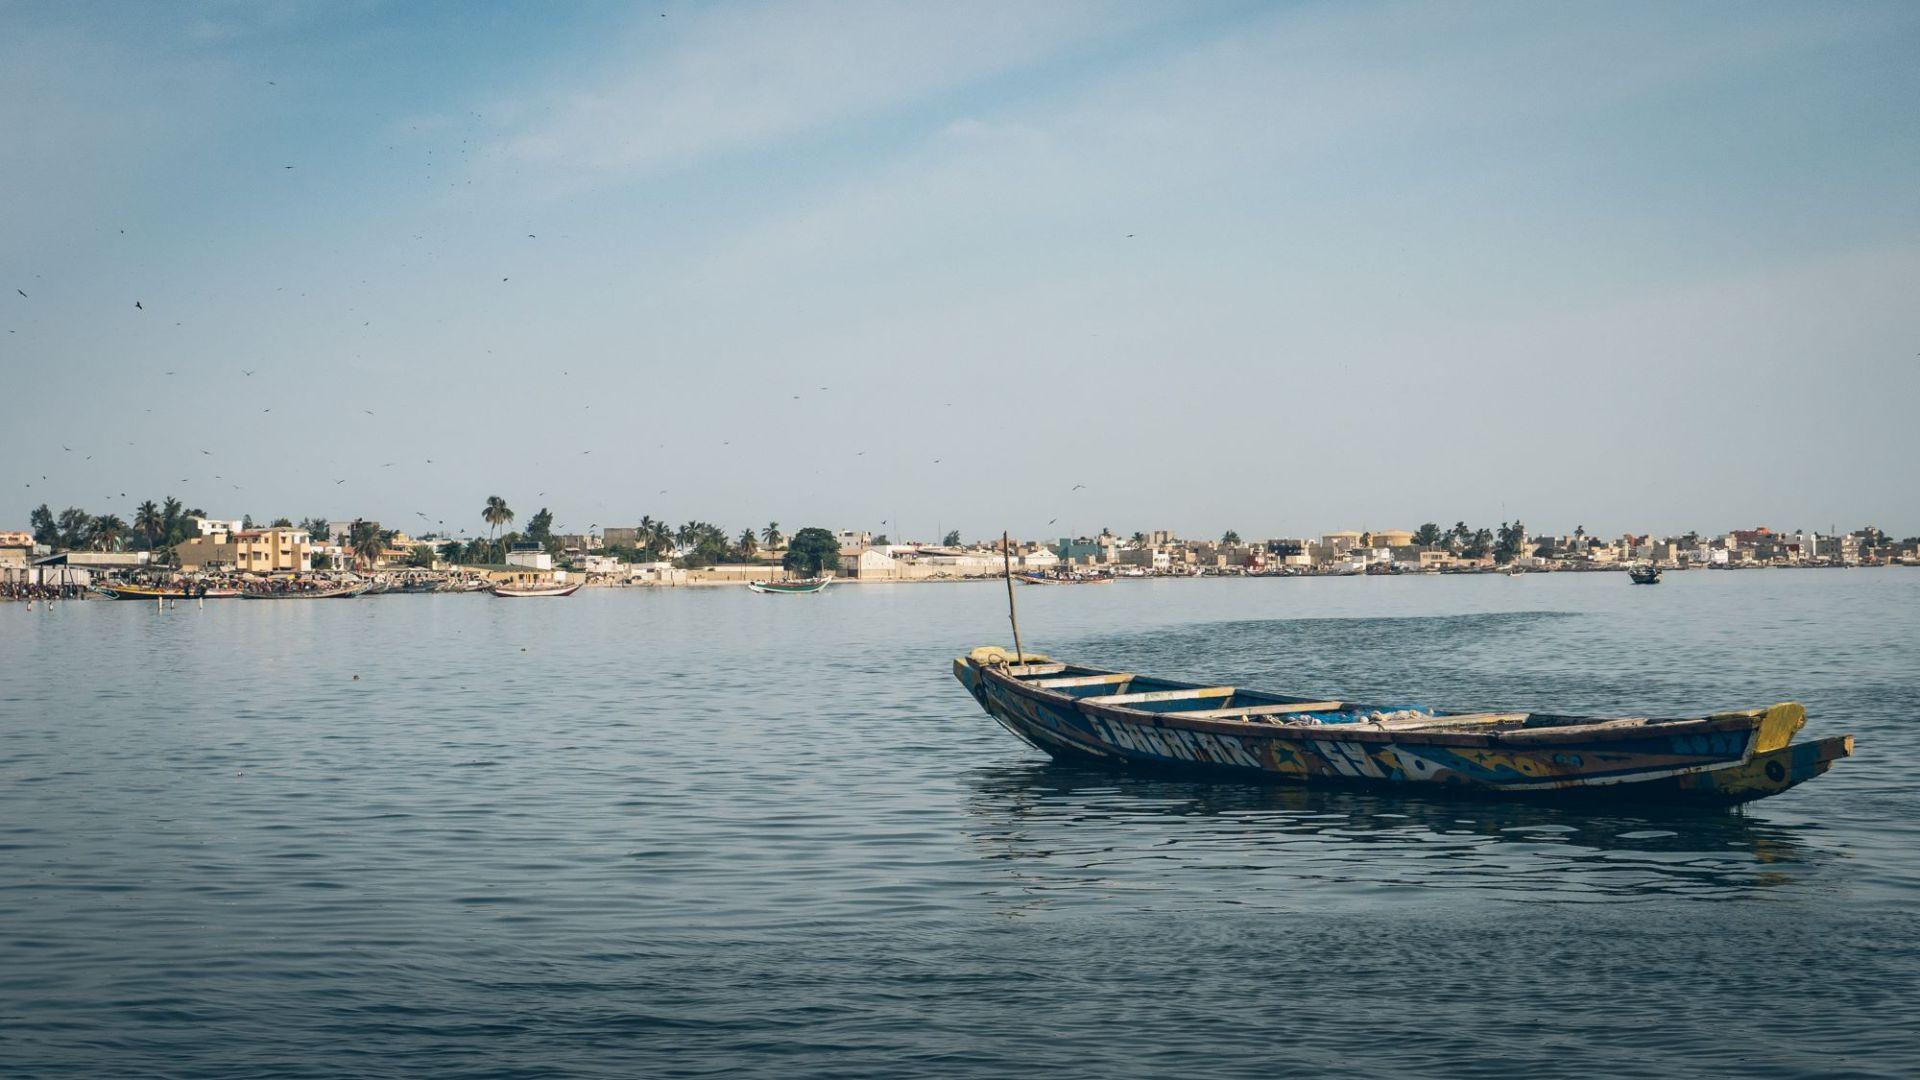 Bateau de pêche à Dakar